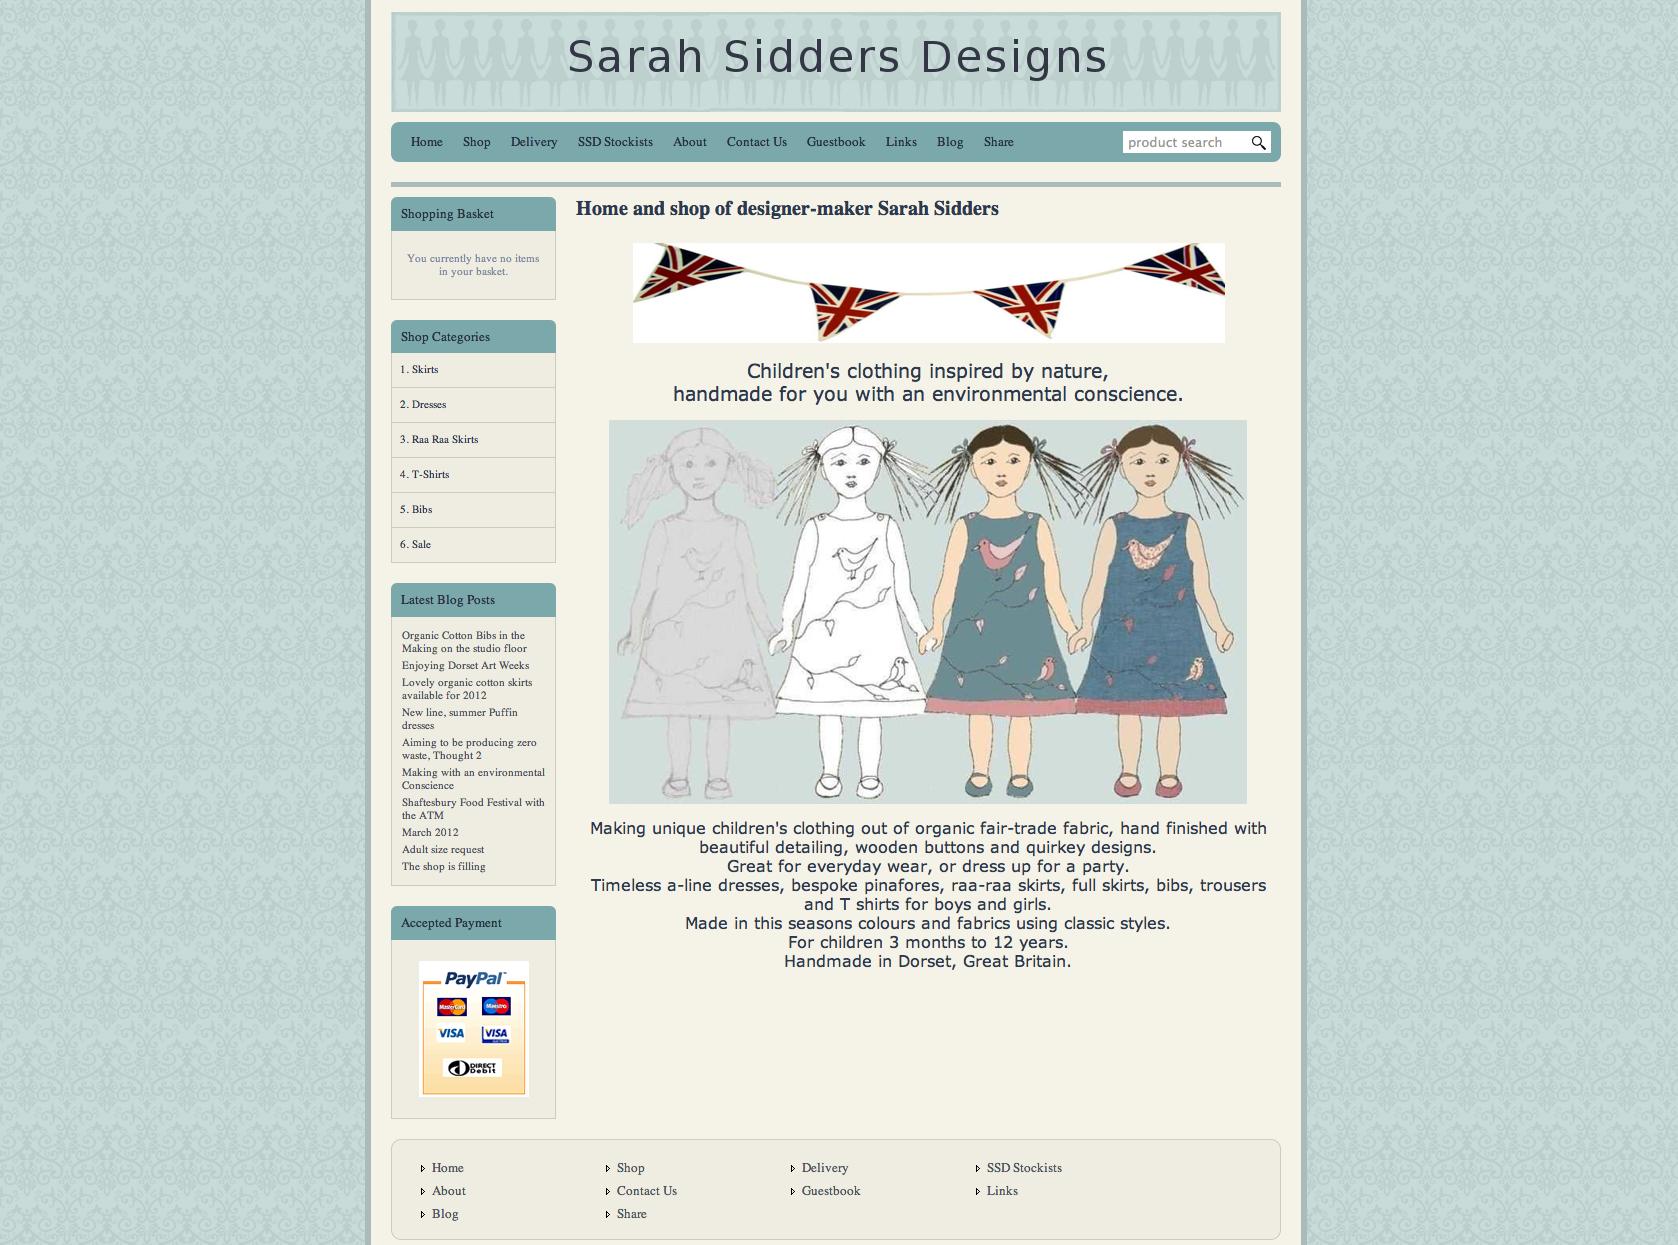 Sarah Sidders Designs